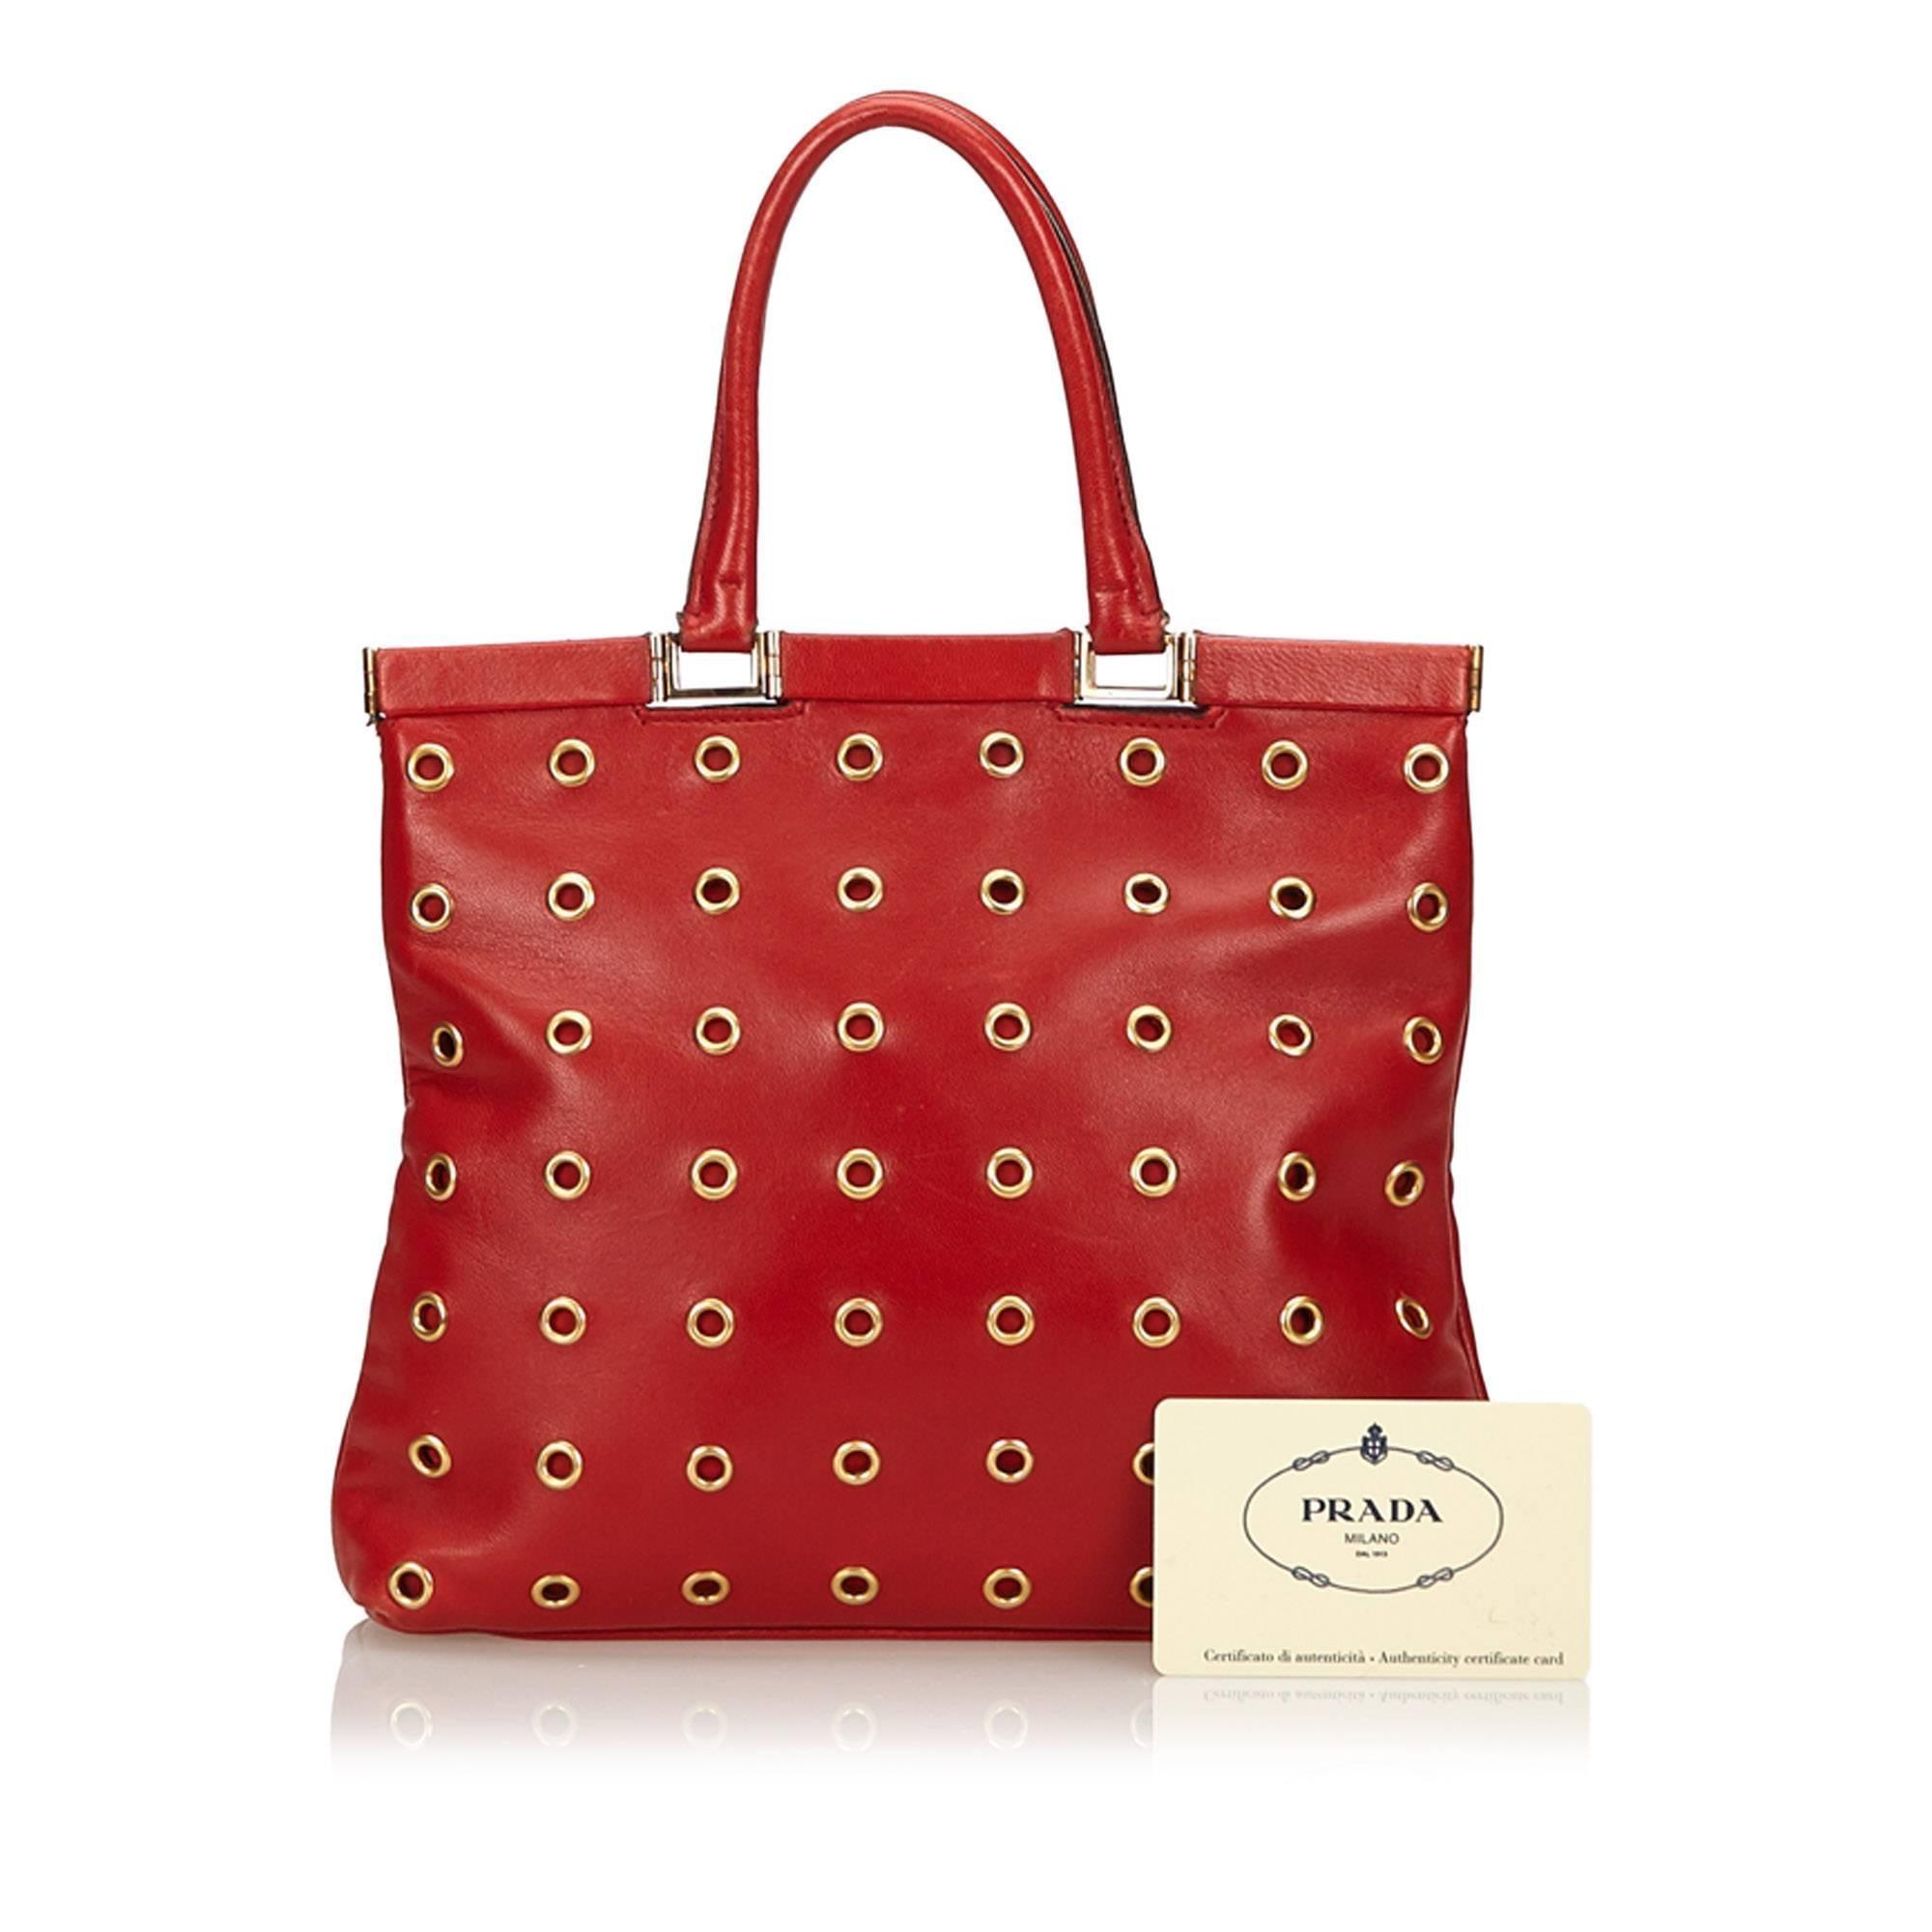 24f2ac46c49f8f ... netherlands prada red calf leather 18 carat gold toned eyelet handbag  for sale 5 2f317 0be23